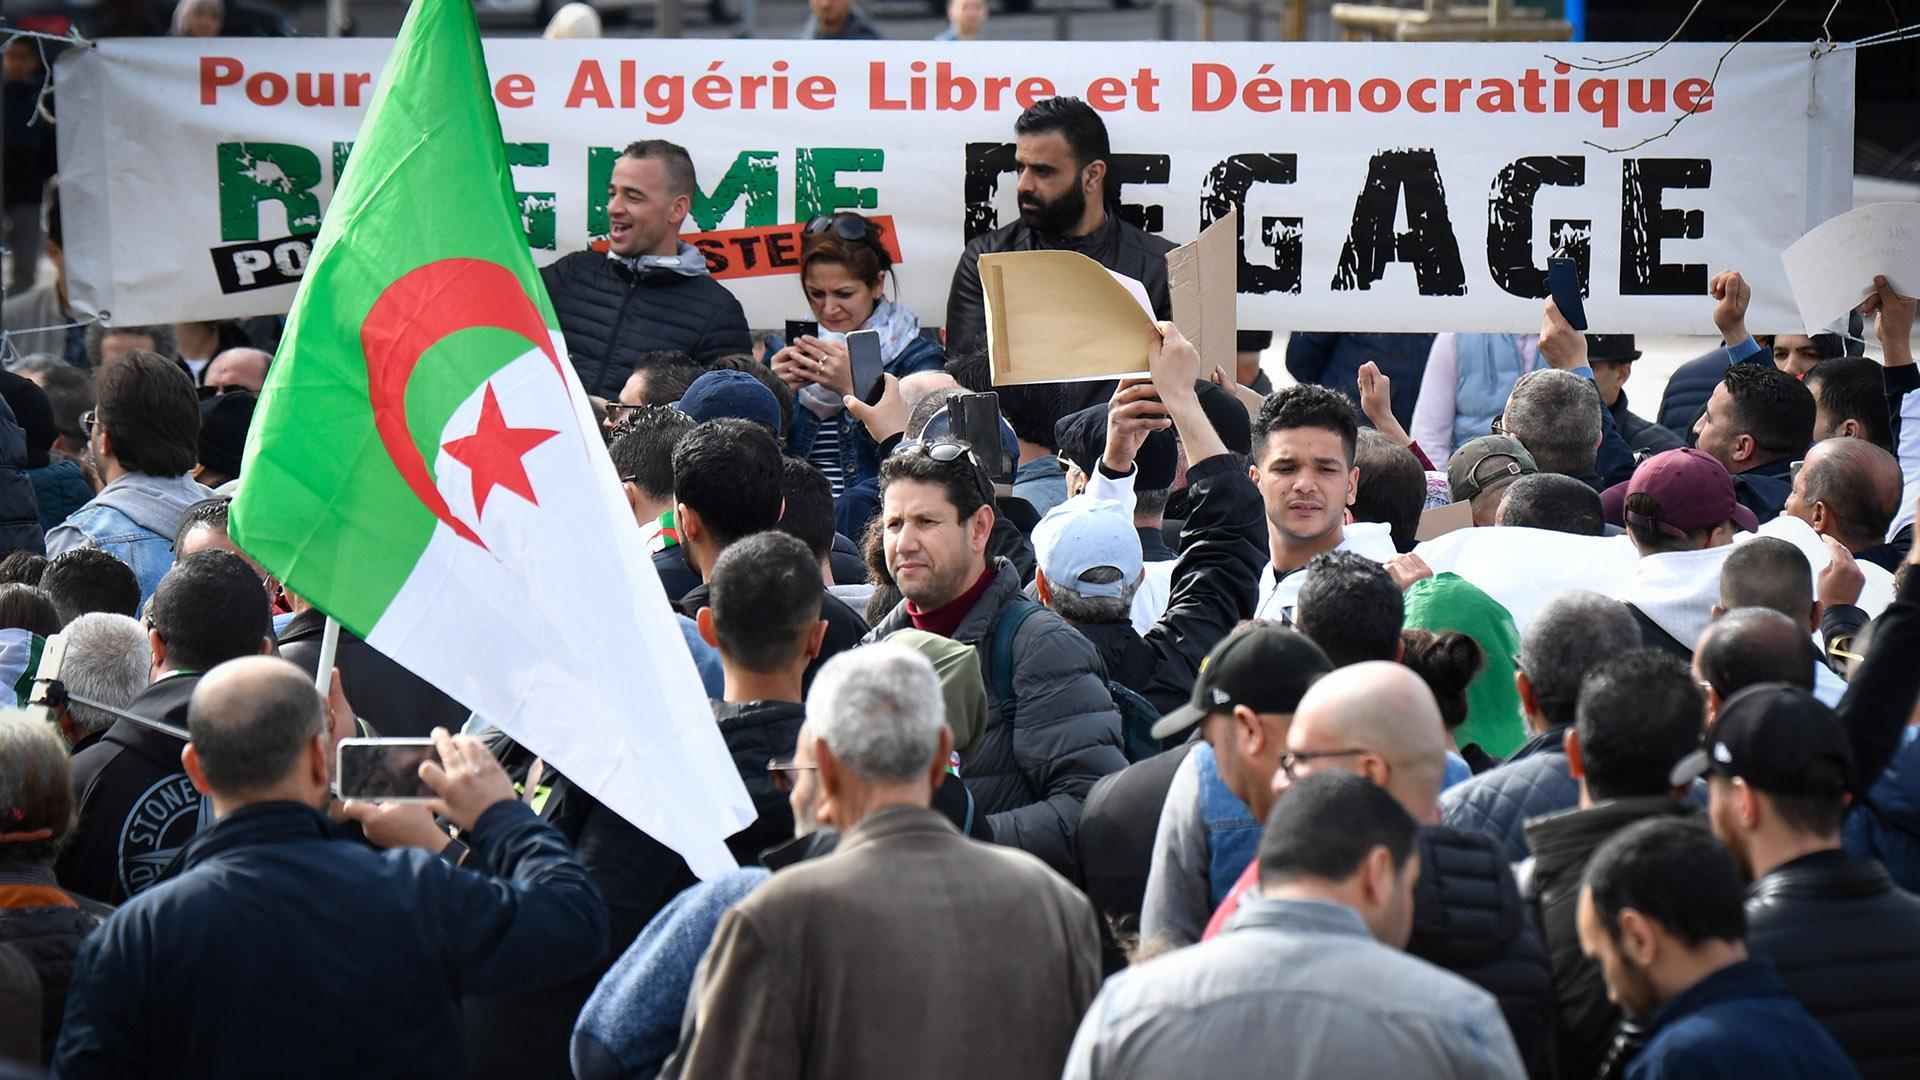 الجزائر .. حراك مستمر